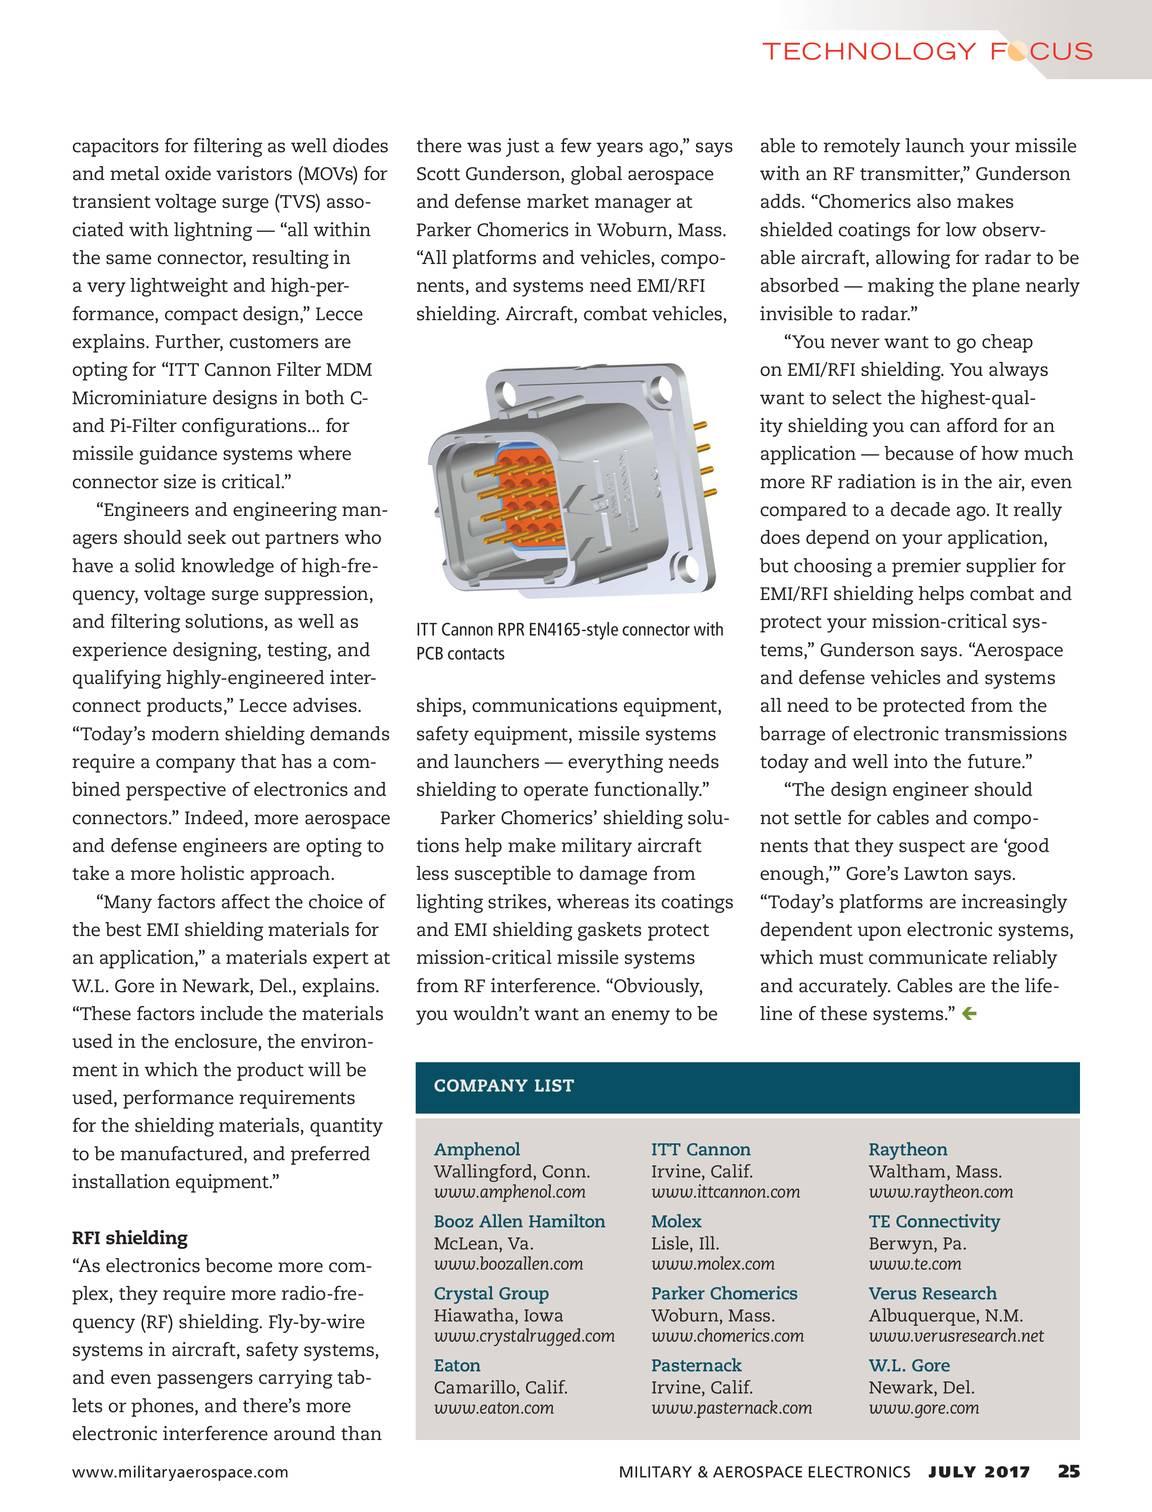 Military Aerospace Electronics July 2017 Page 24 Raytheon Wiring Harness 25